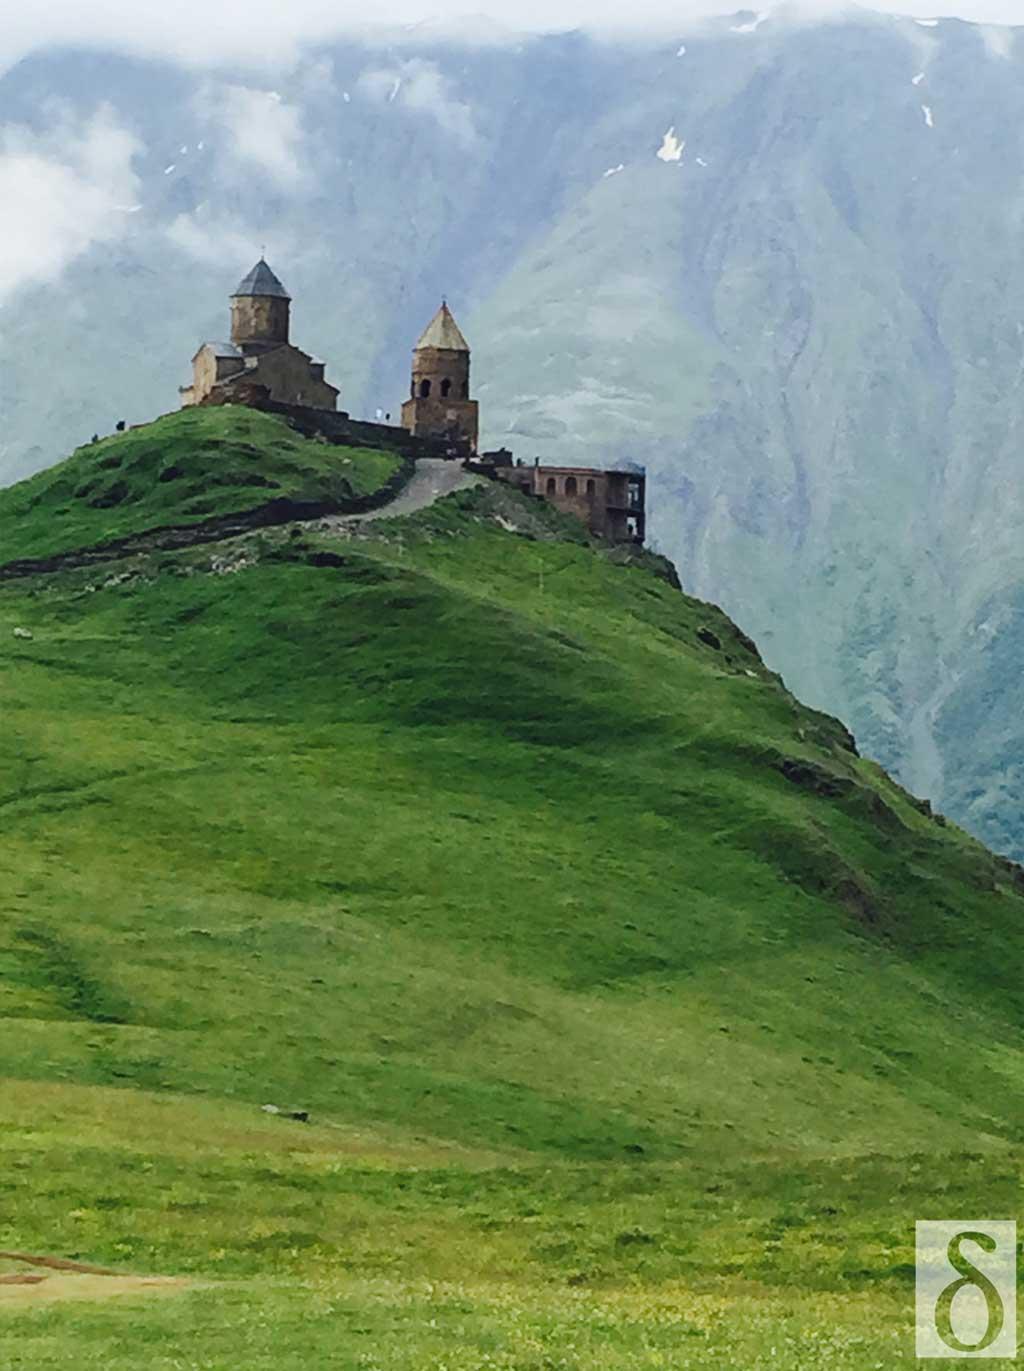 castle-in-the-hills-georgia